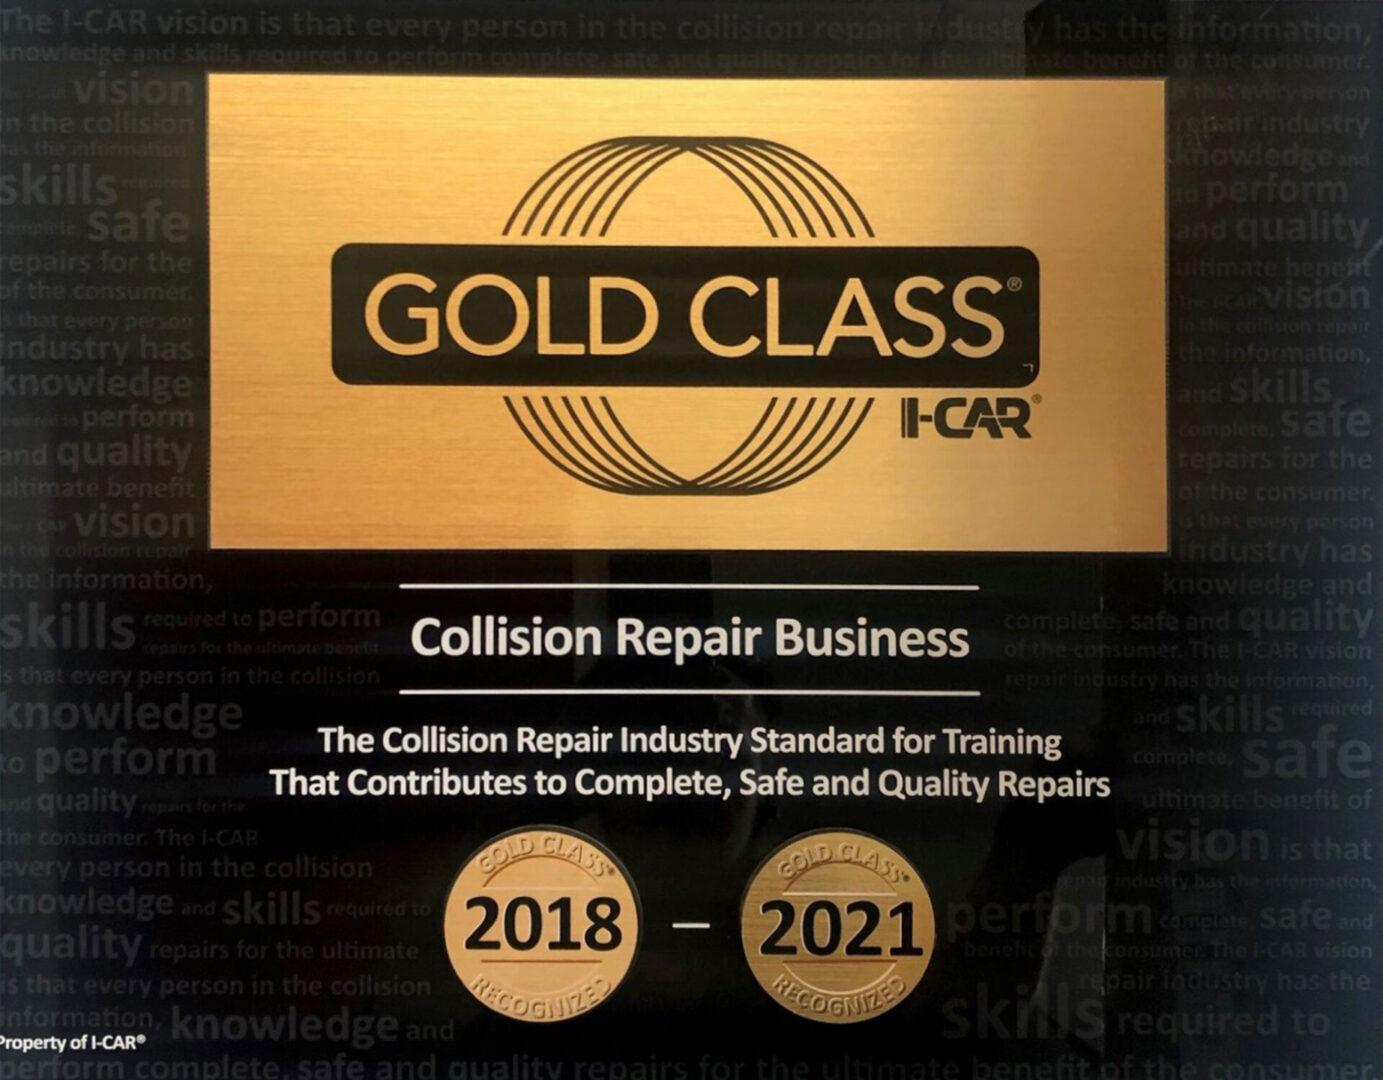 https://autosportcollisionrepair.com/wp-content/uploads/2021/07/Gold-Class-1-scaled.jpg